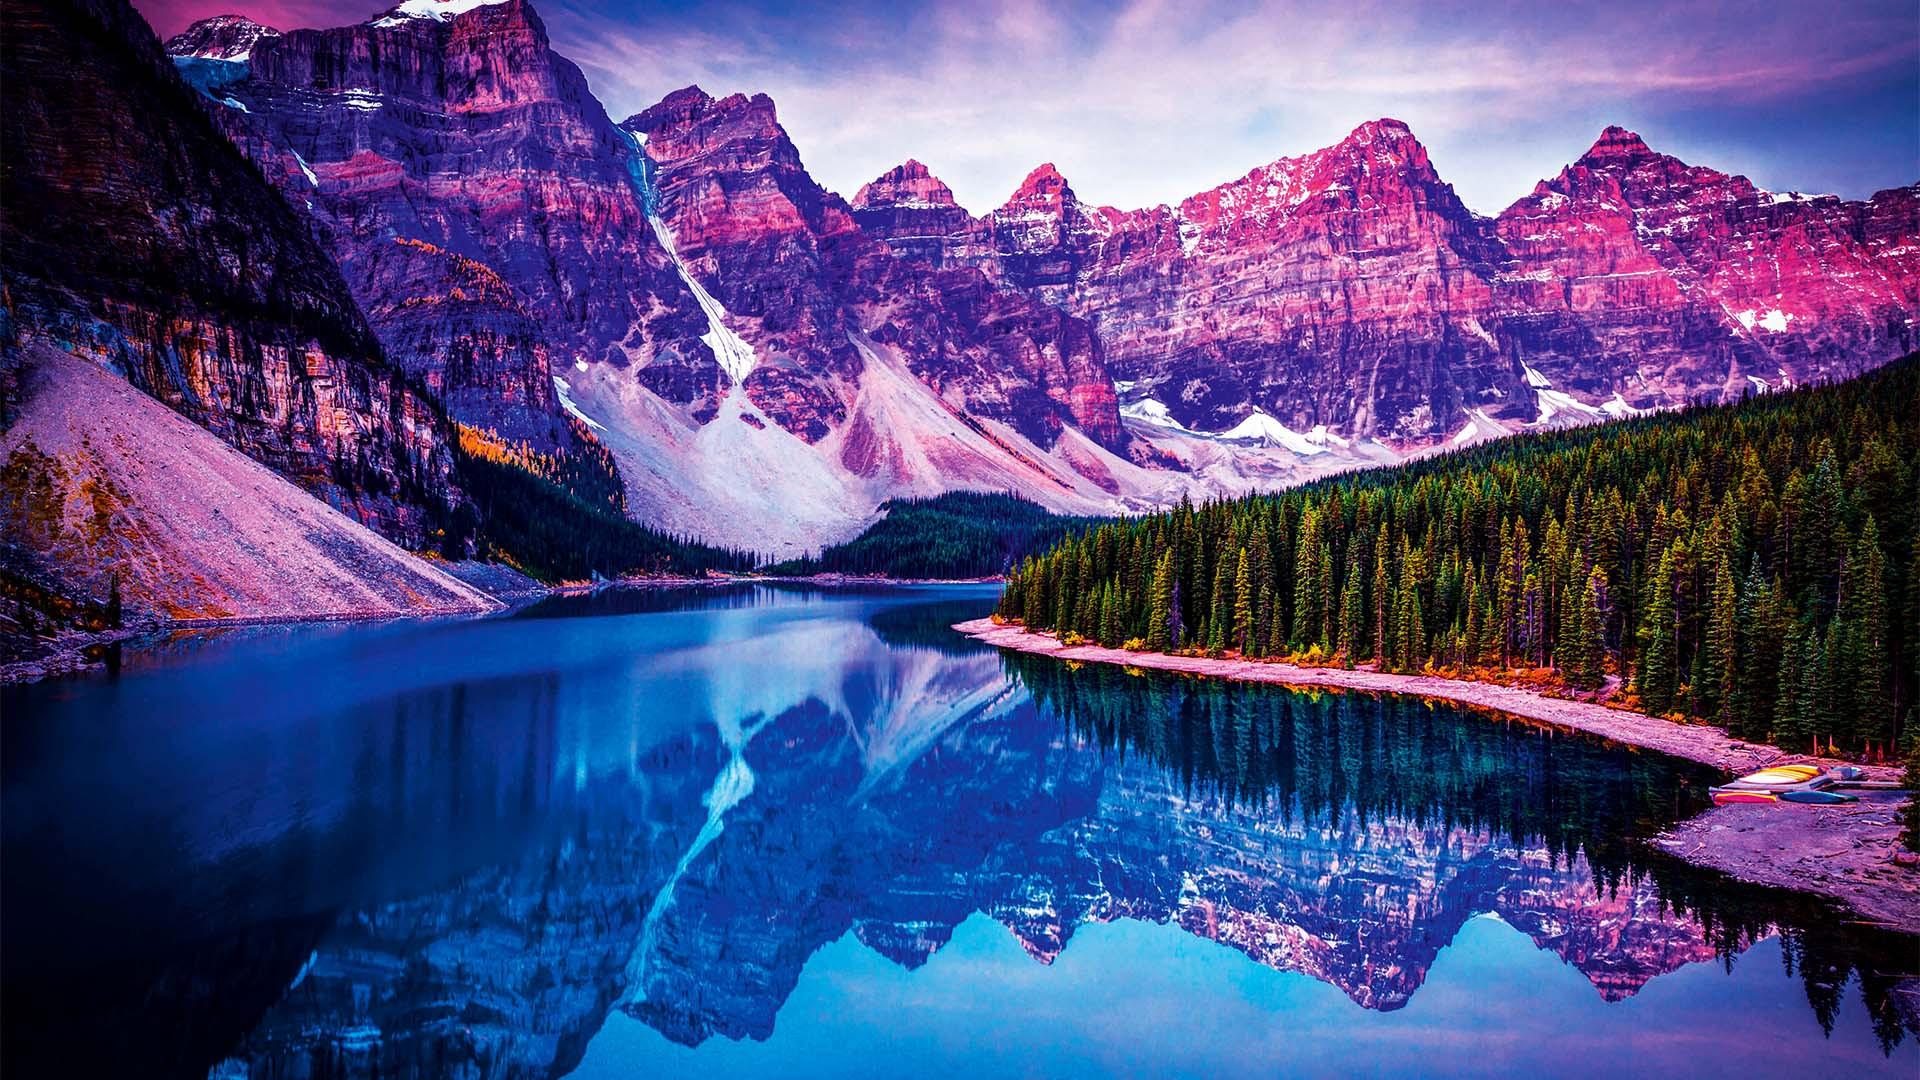 Wan Ru Chen, Moraine Lake, Canadian Rockies, Canada